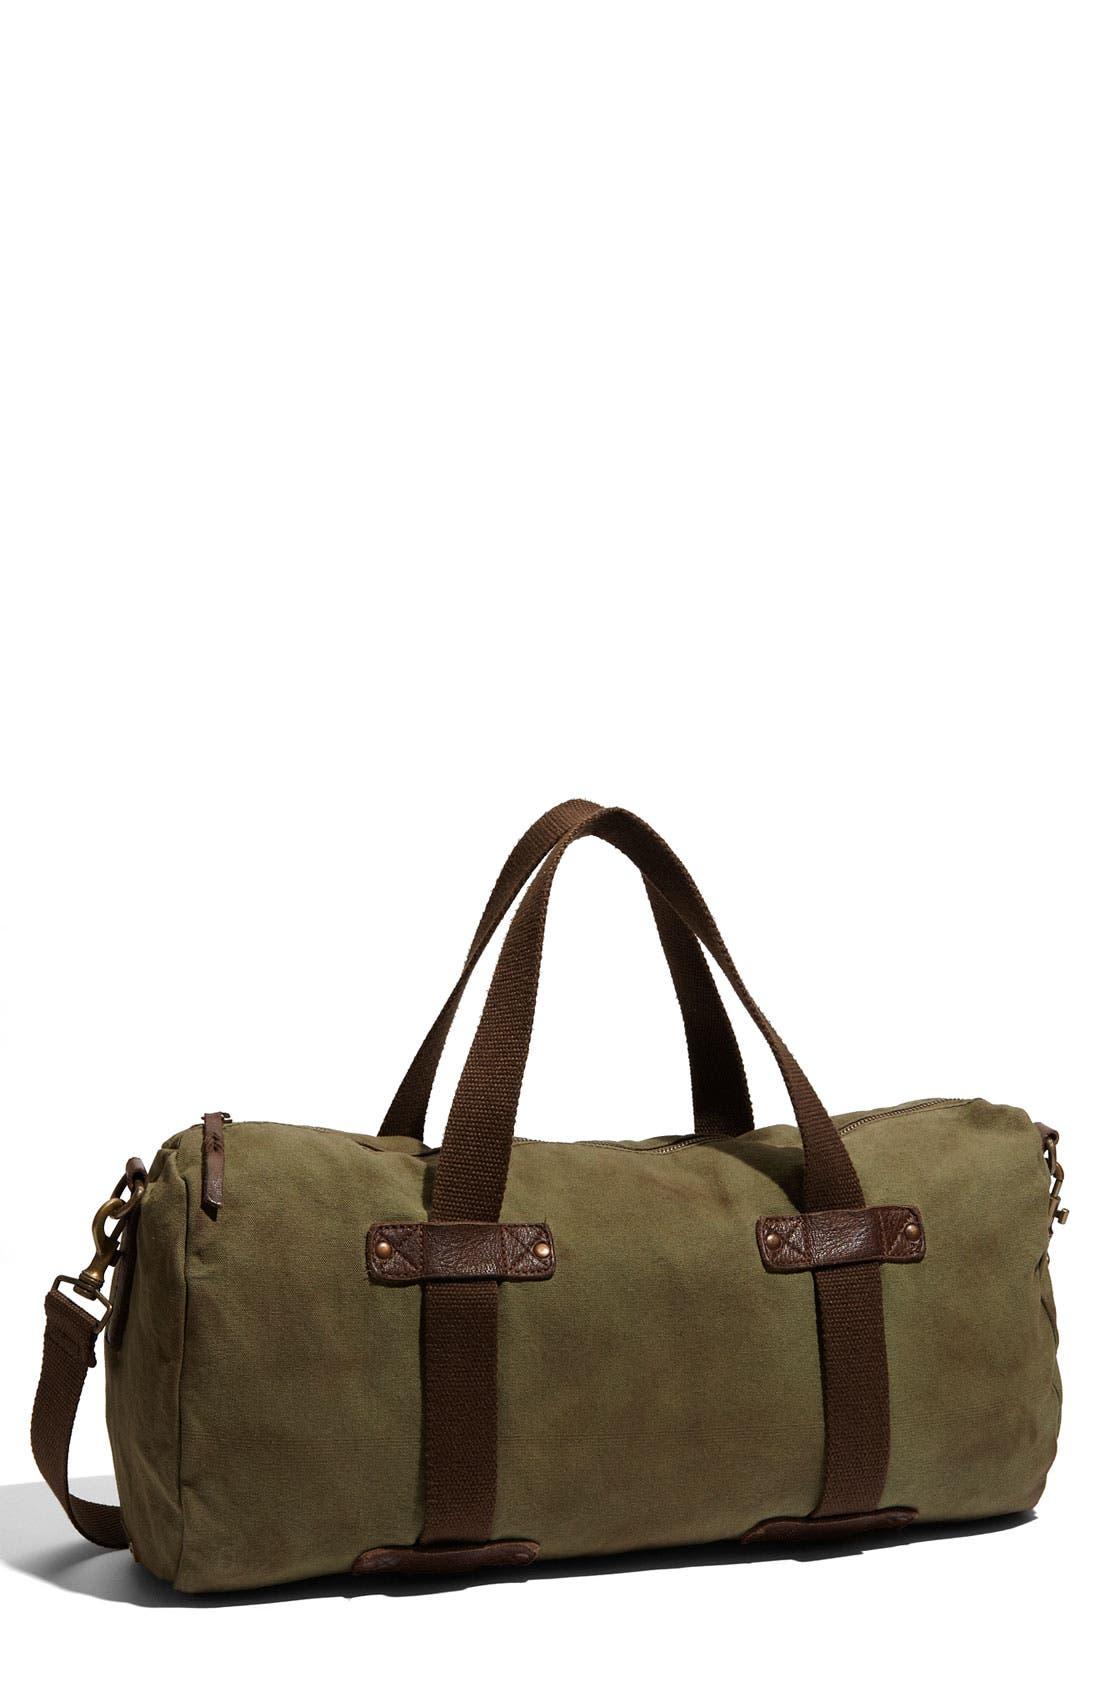 Canvas Duffel Bag,                         Main,                         color, Army